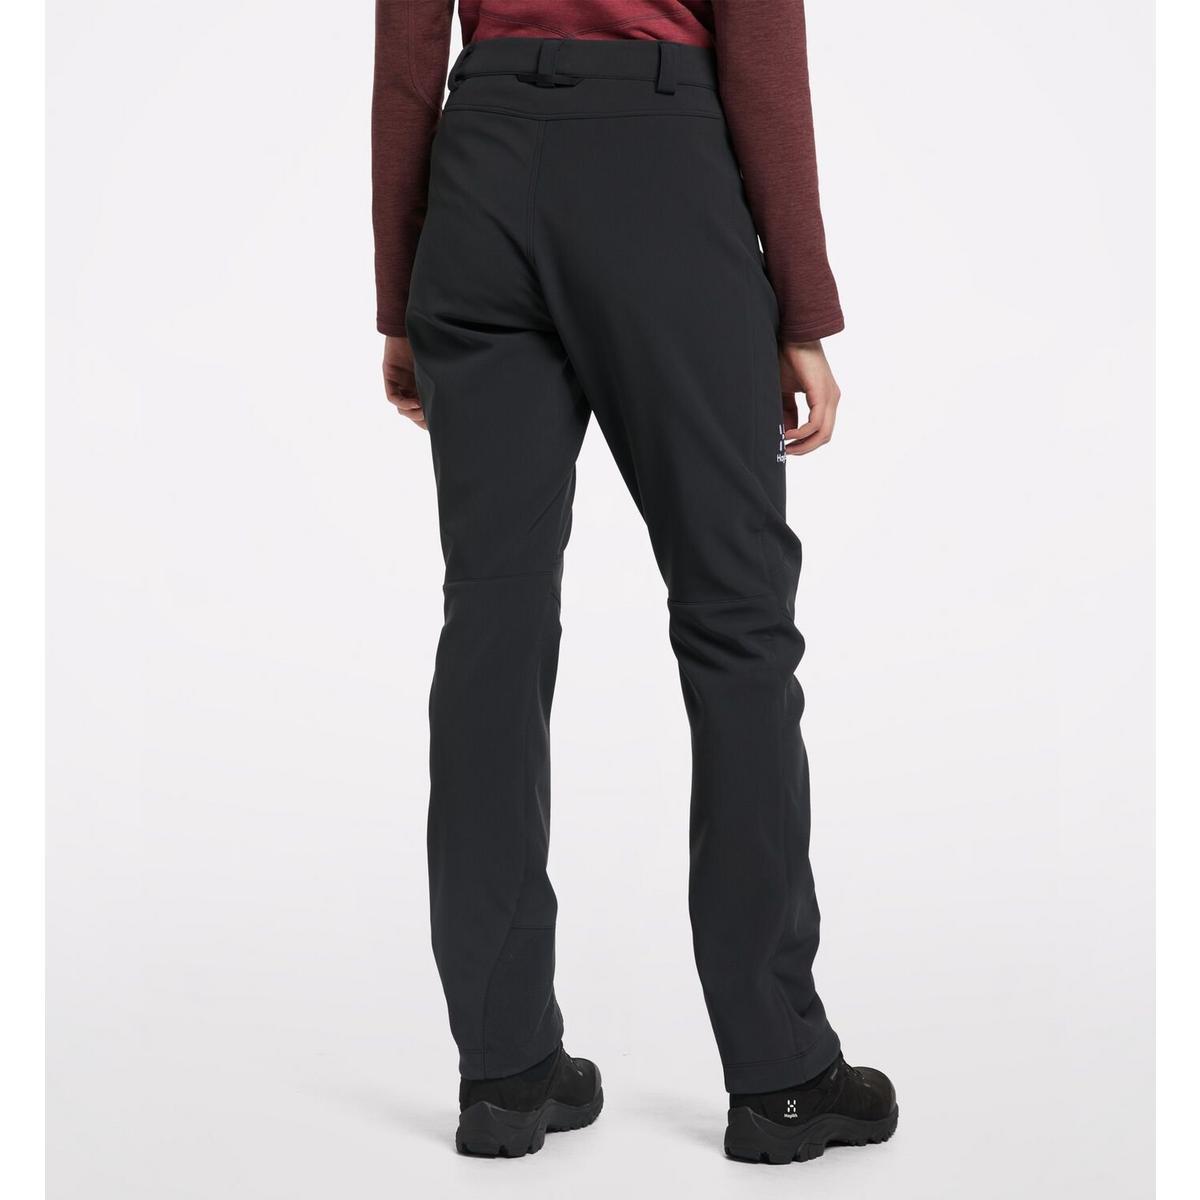 Haglofs Women's Haglofs Clay Pant - Black